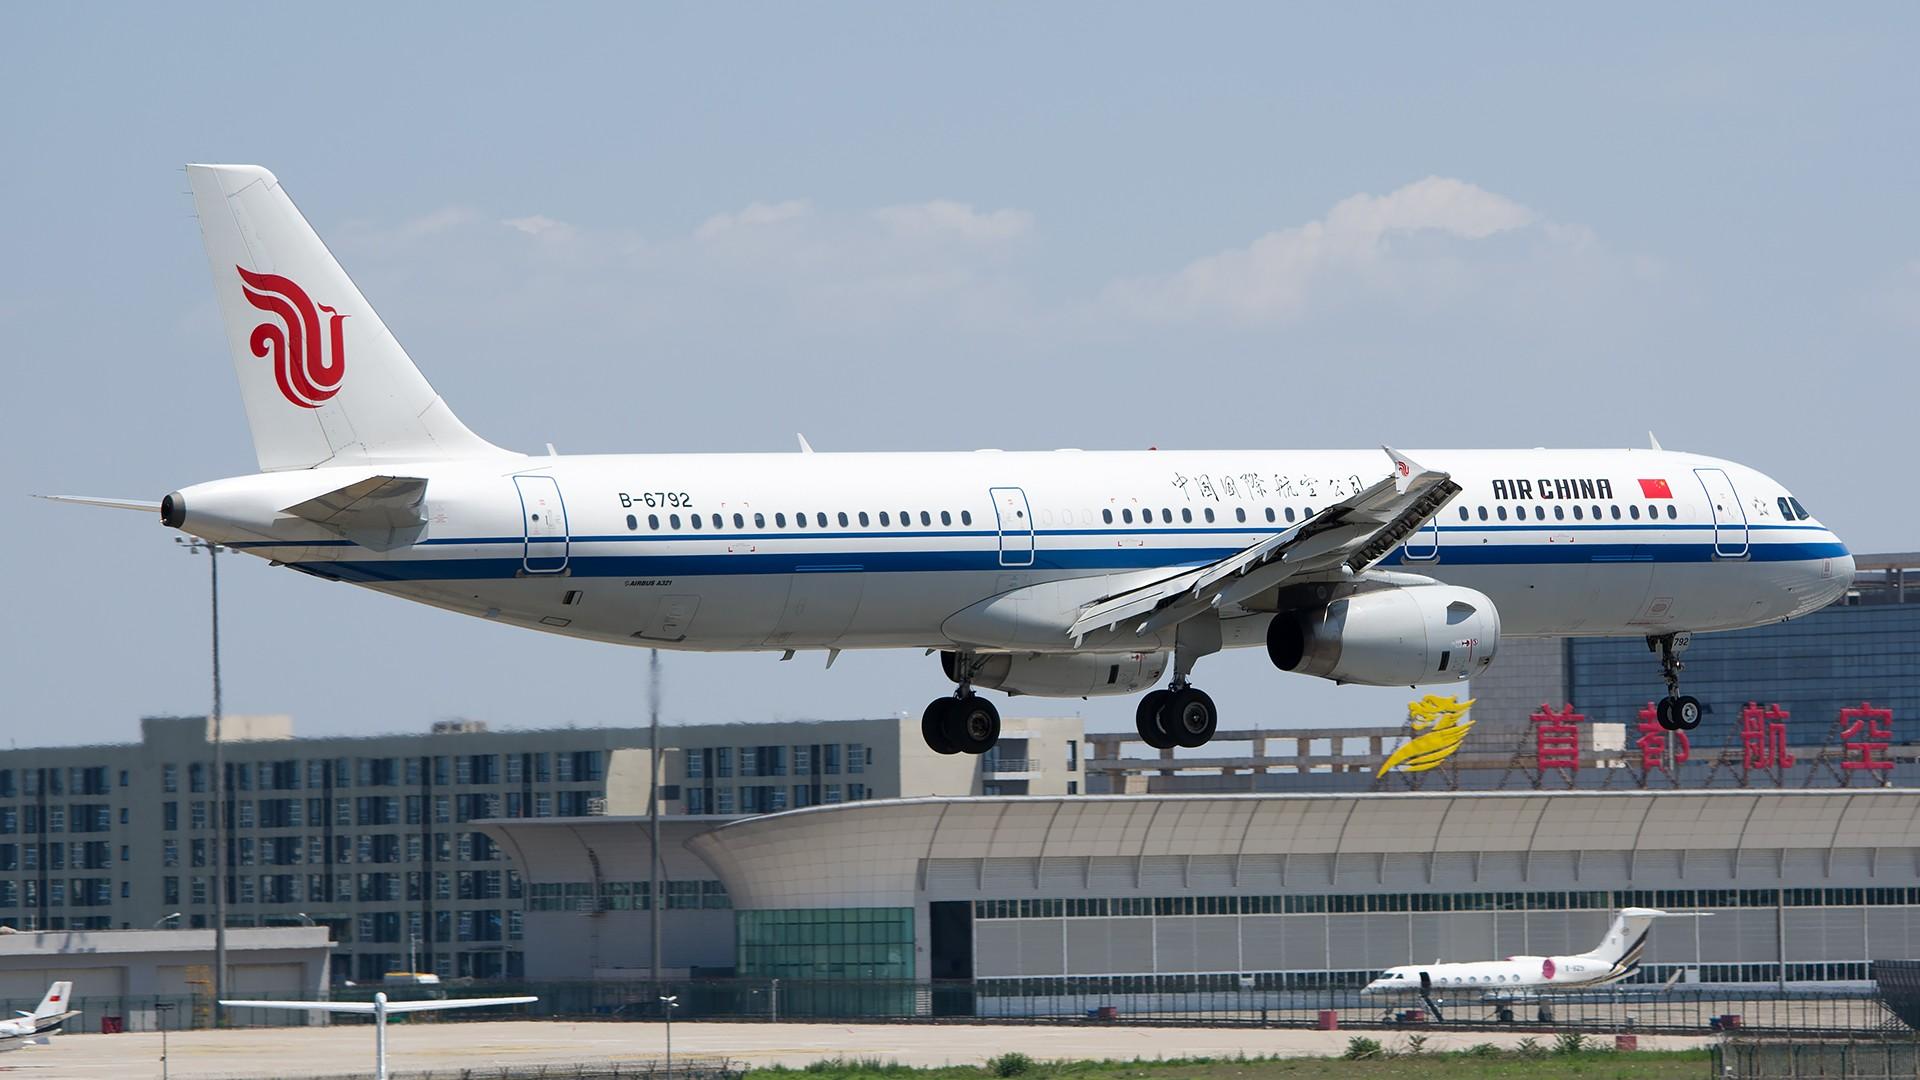 Re:[原创]高空低涡最后一天的PEK杂图【2015-6-14】 AIRBUS A321-200 B-6792 中国北京首都国际机场